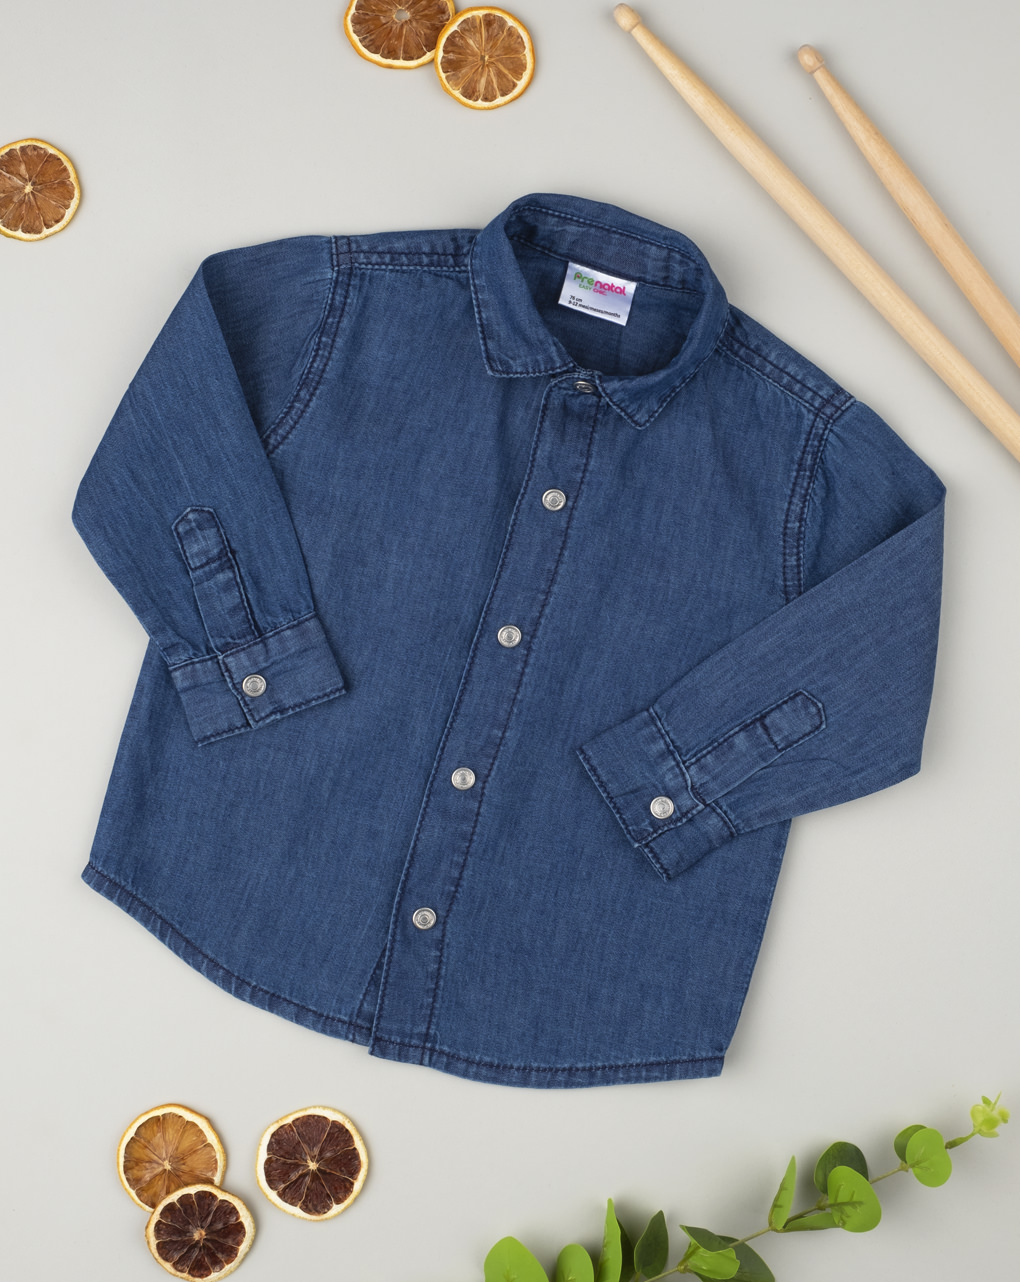 Camicia di jeans boy - Prénatal